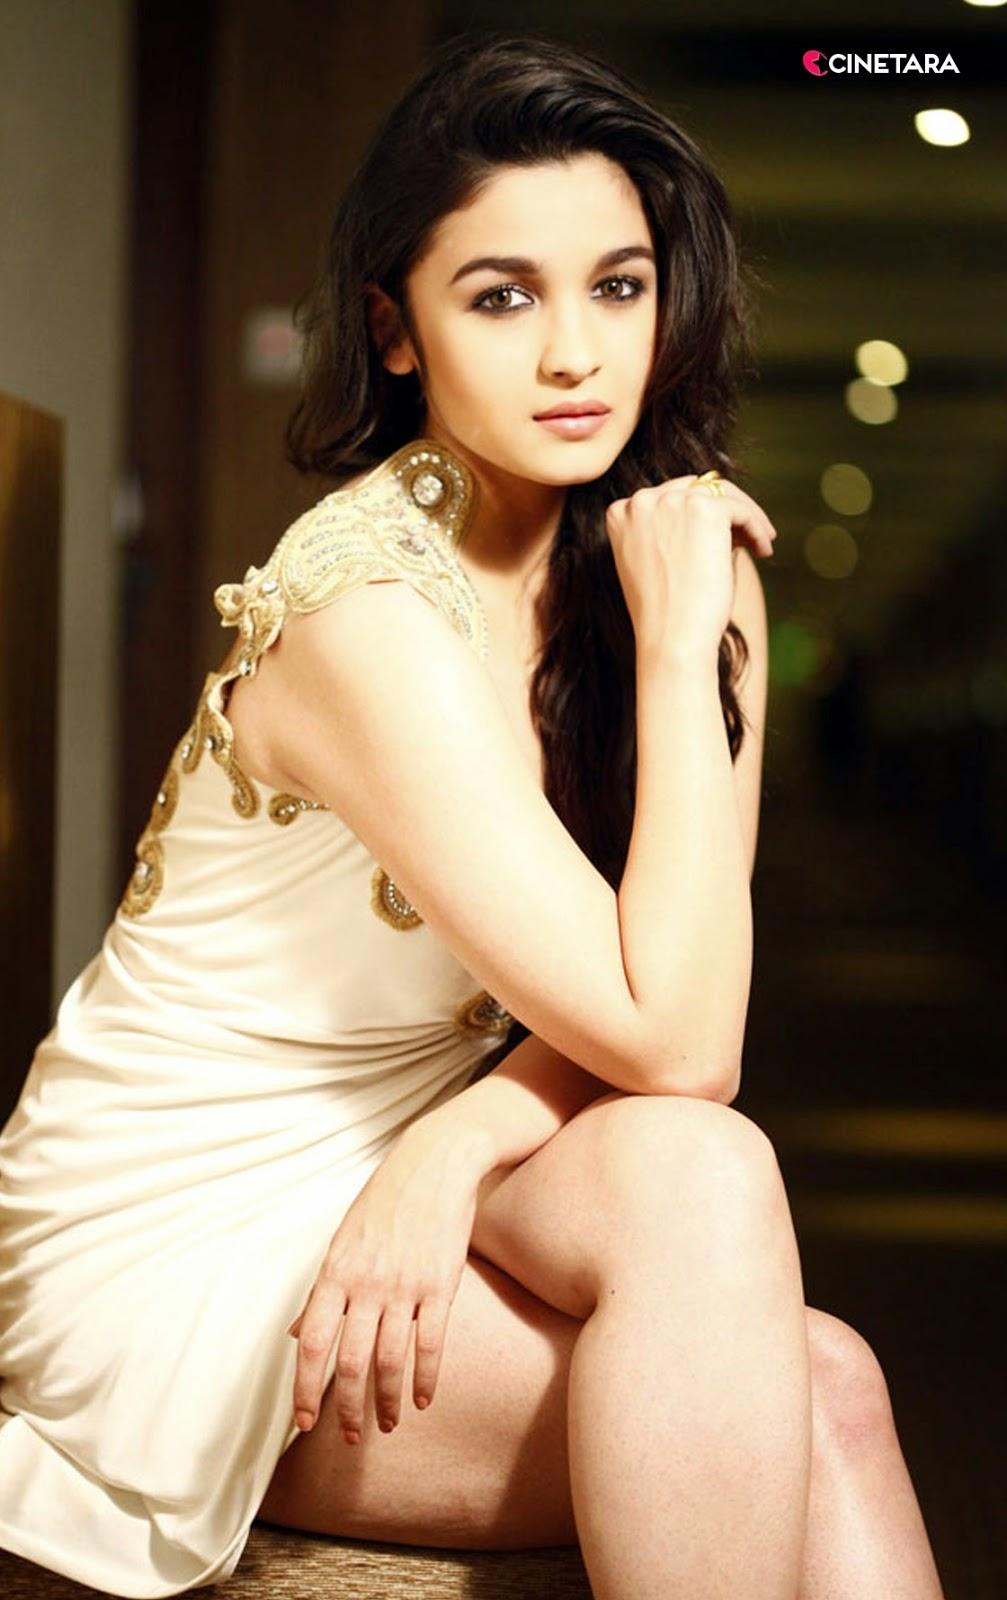 Alia Bhatt Sexy Legs Photoshoot, Full HD Wallpaper